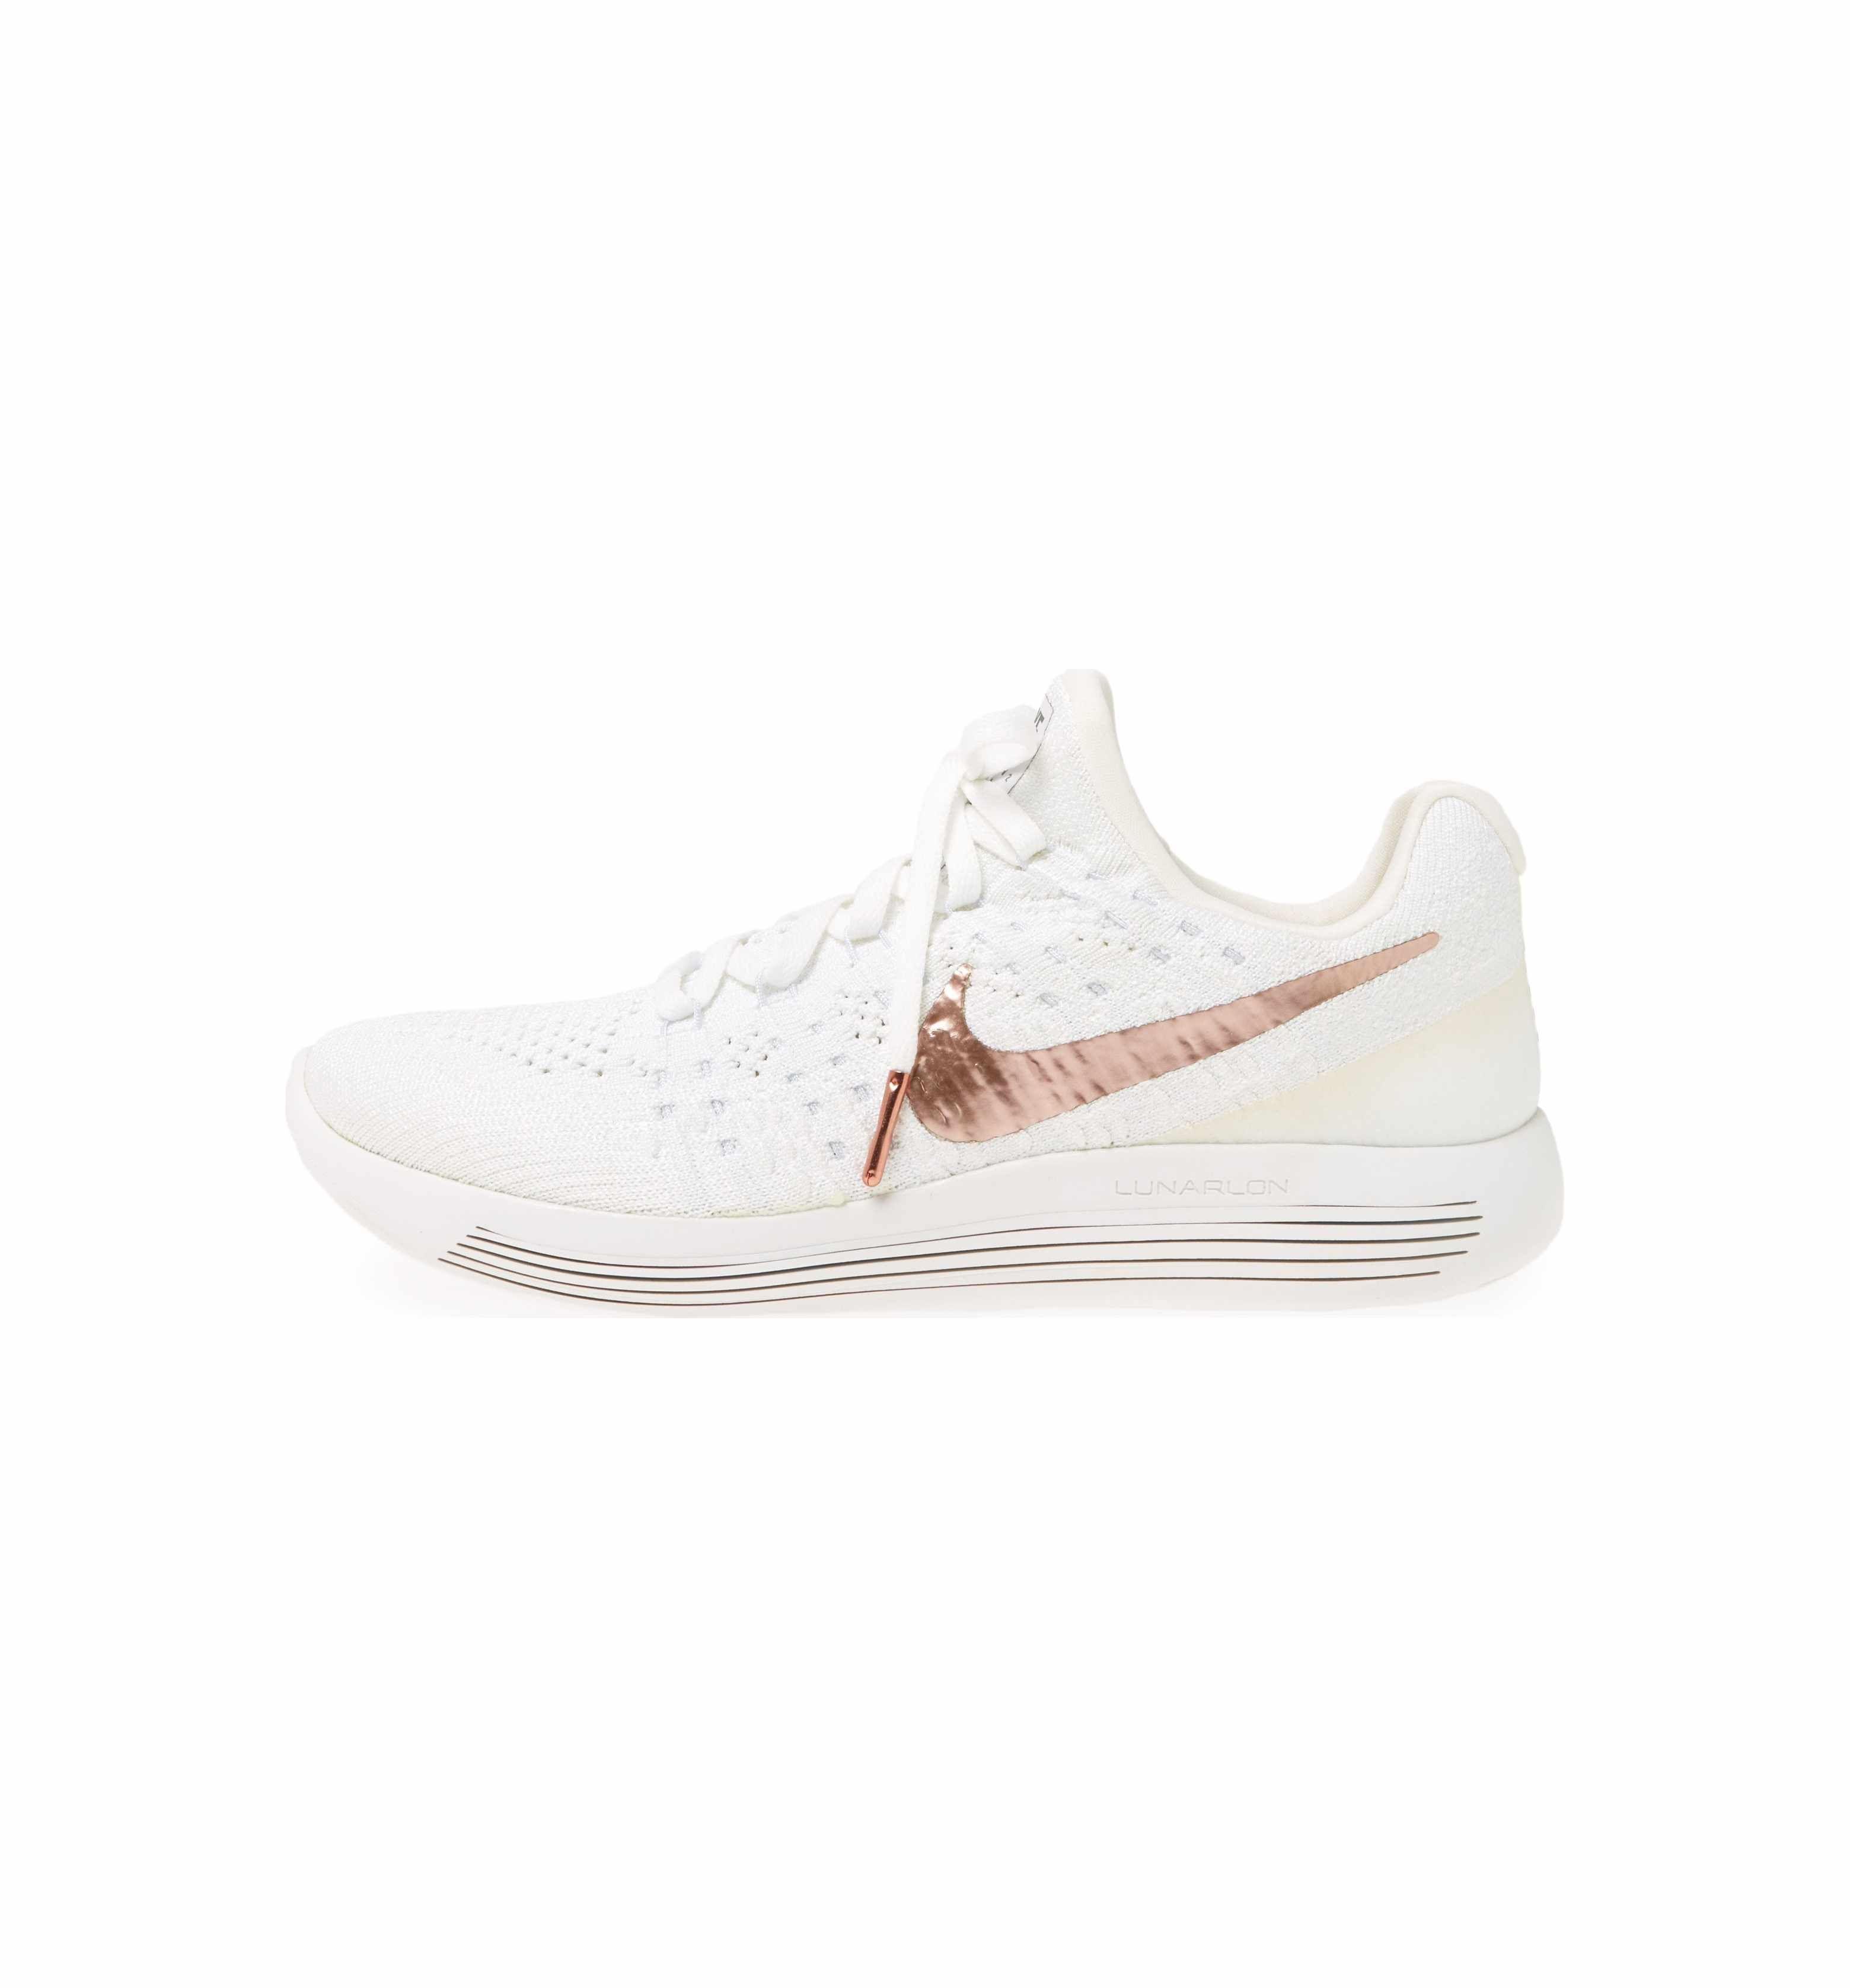 size 40 90d24 b7ac2 ... lunarepic low flyknit 2 x plore running shoe